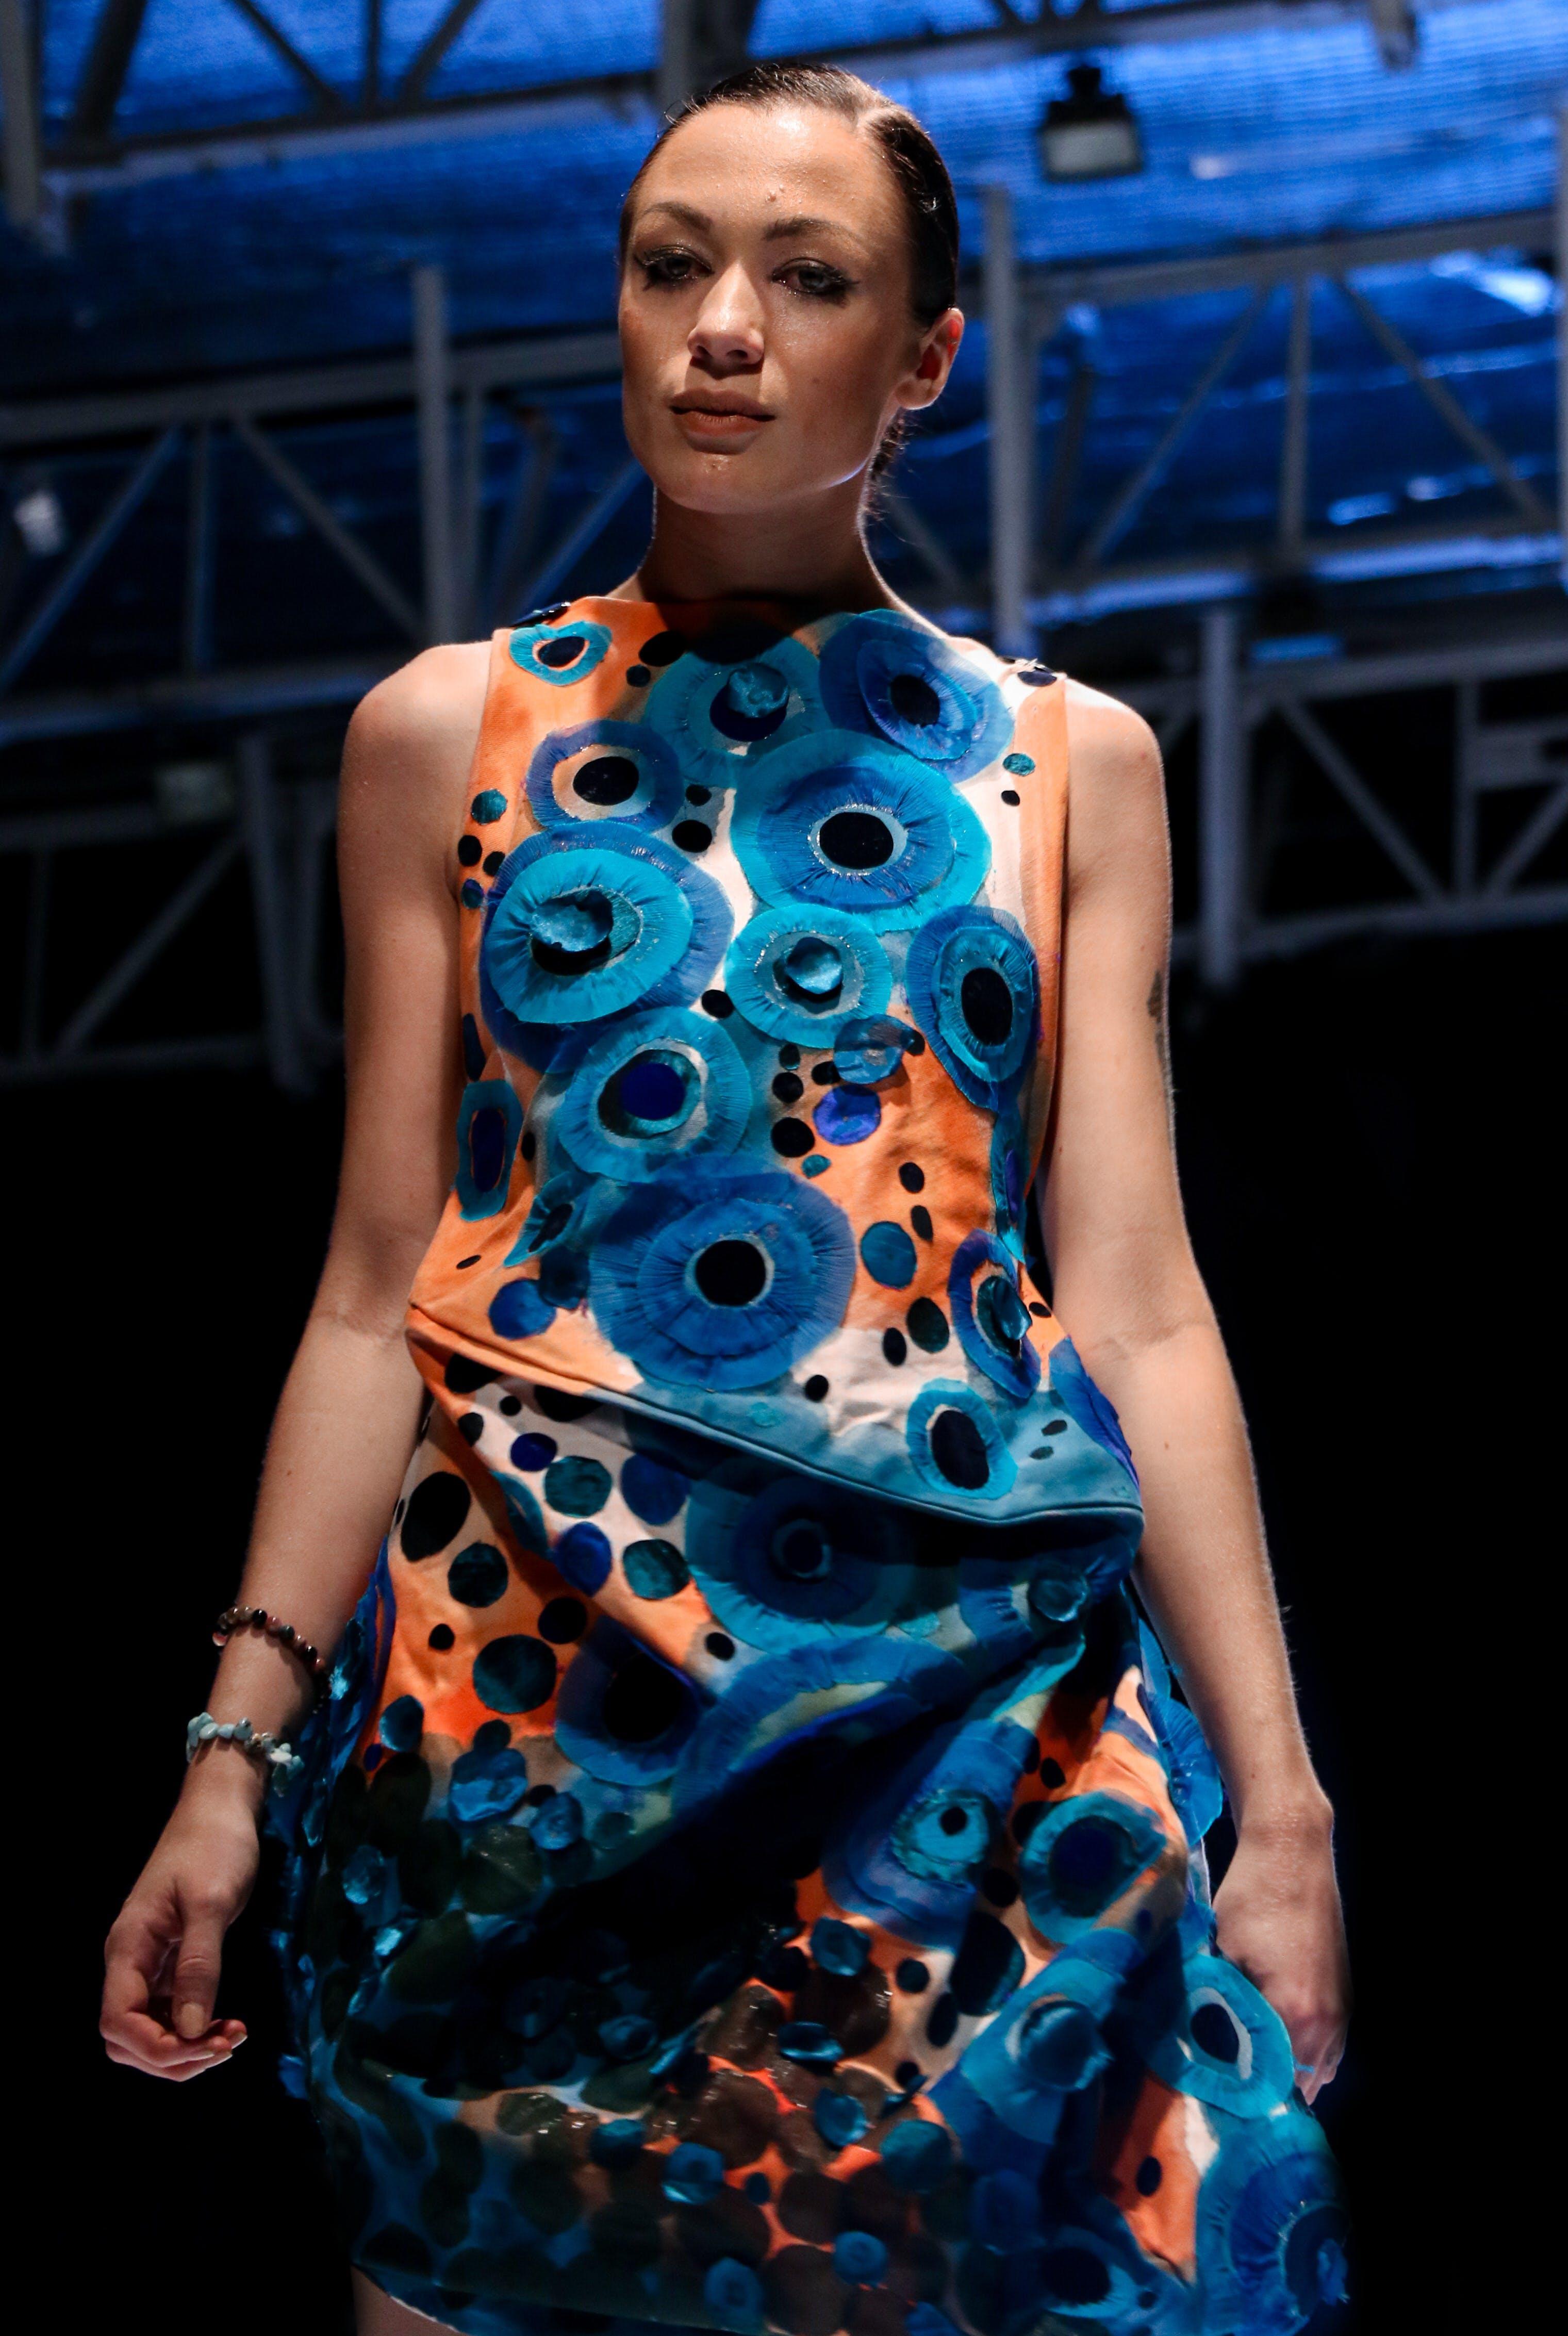 Woman Wearing a Multicolored Sleeveless Dress